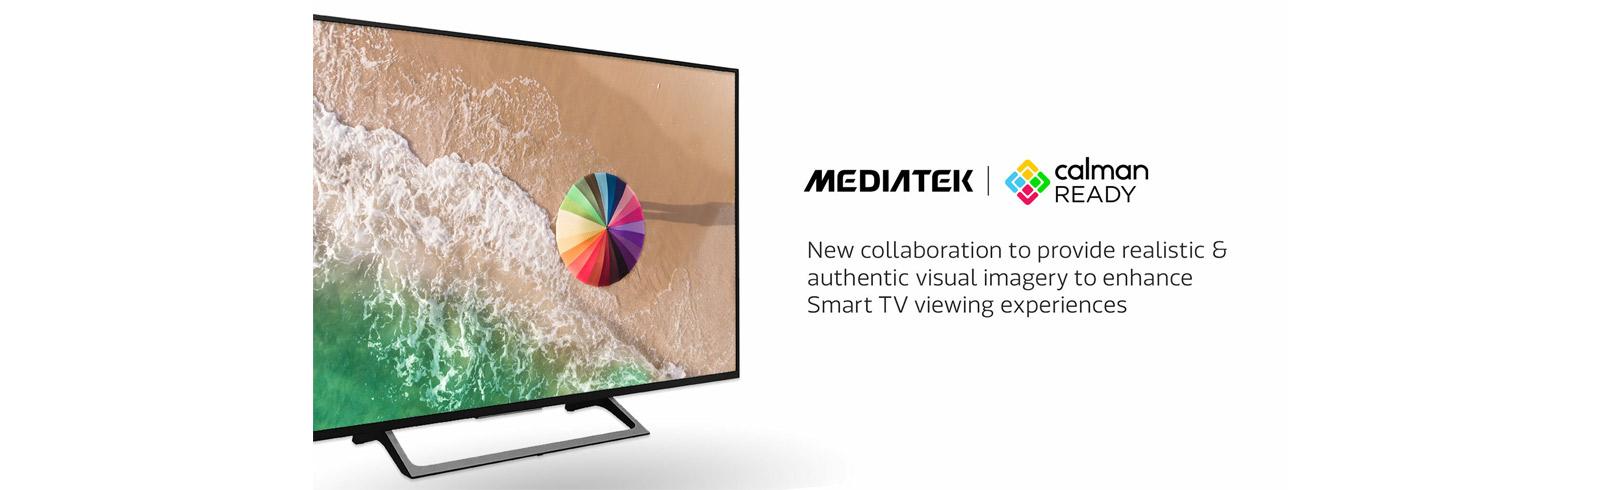 MediaTek and Portrait Displays collaborate on color calibration technologies in Smart TVs